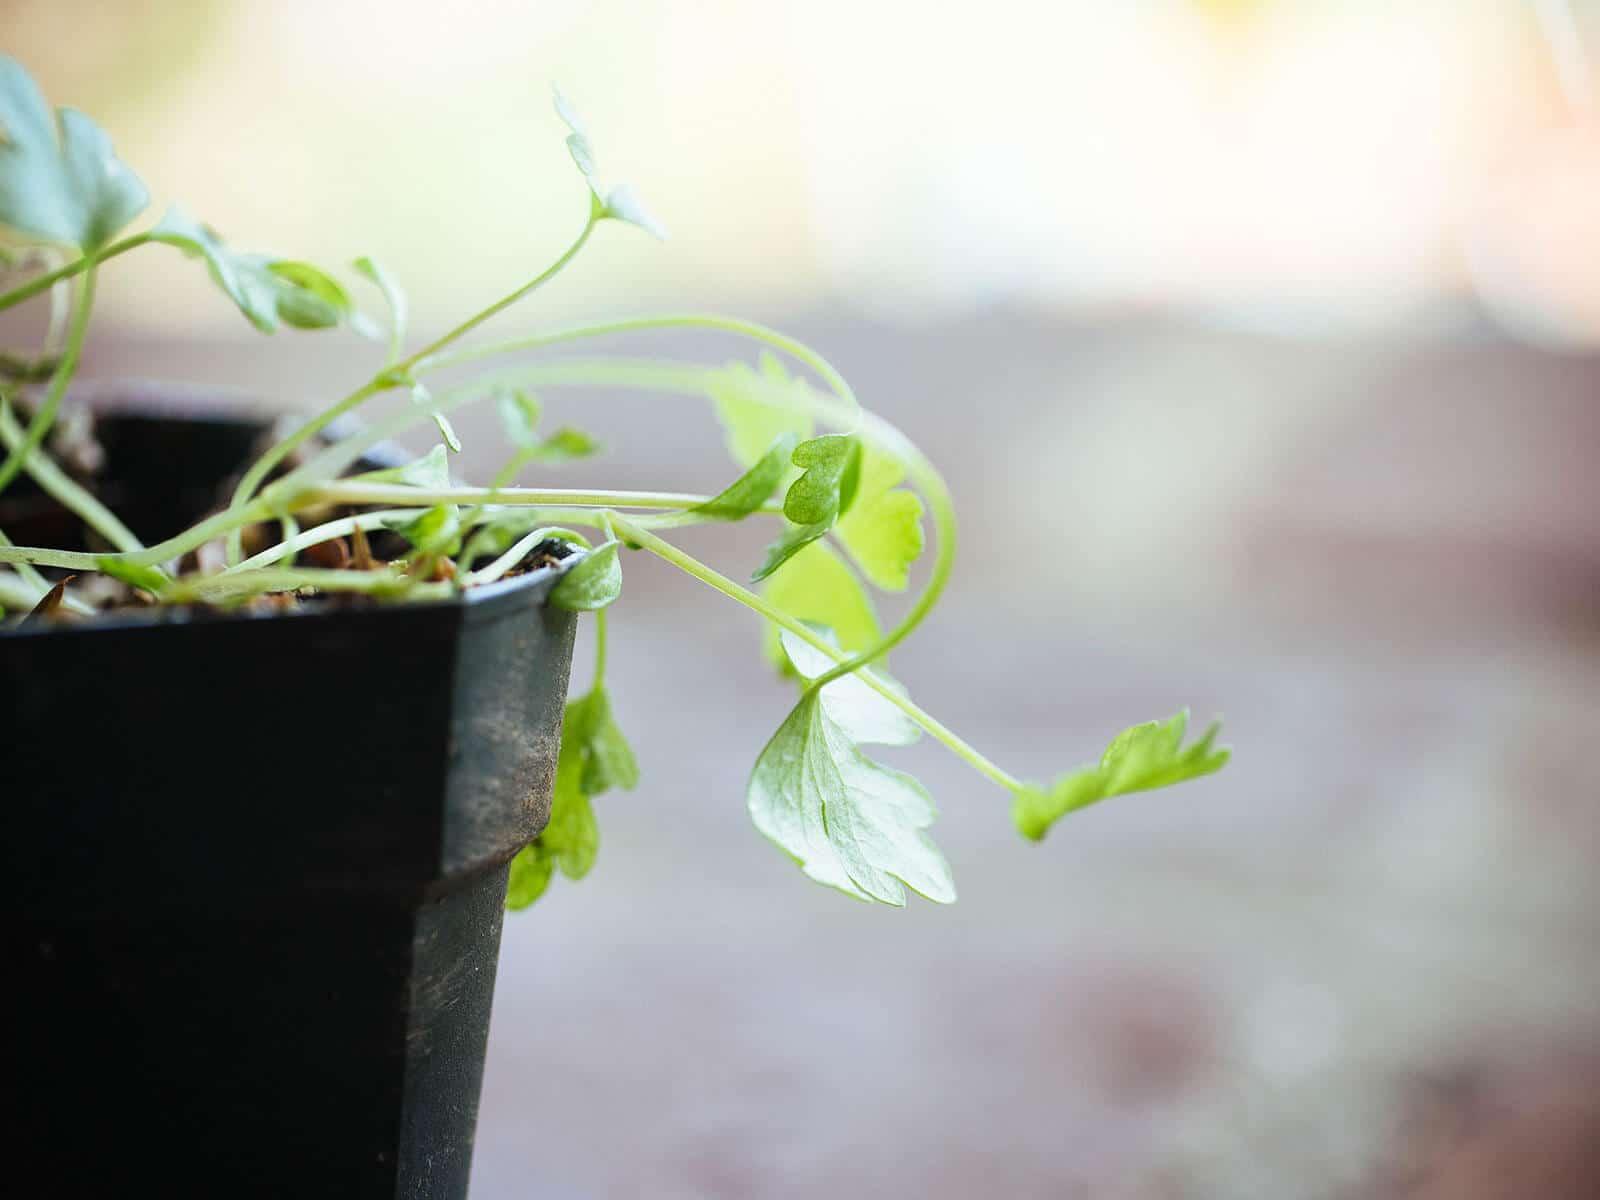 Leggy celery seedlings struggling with too little light for growth